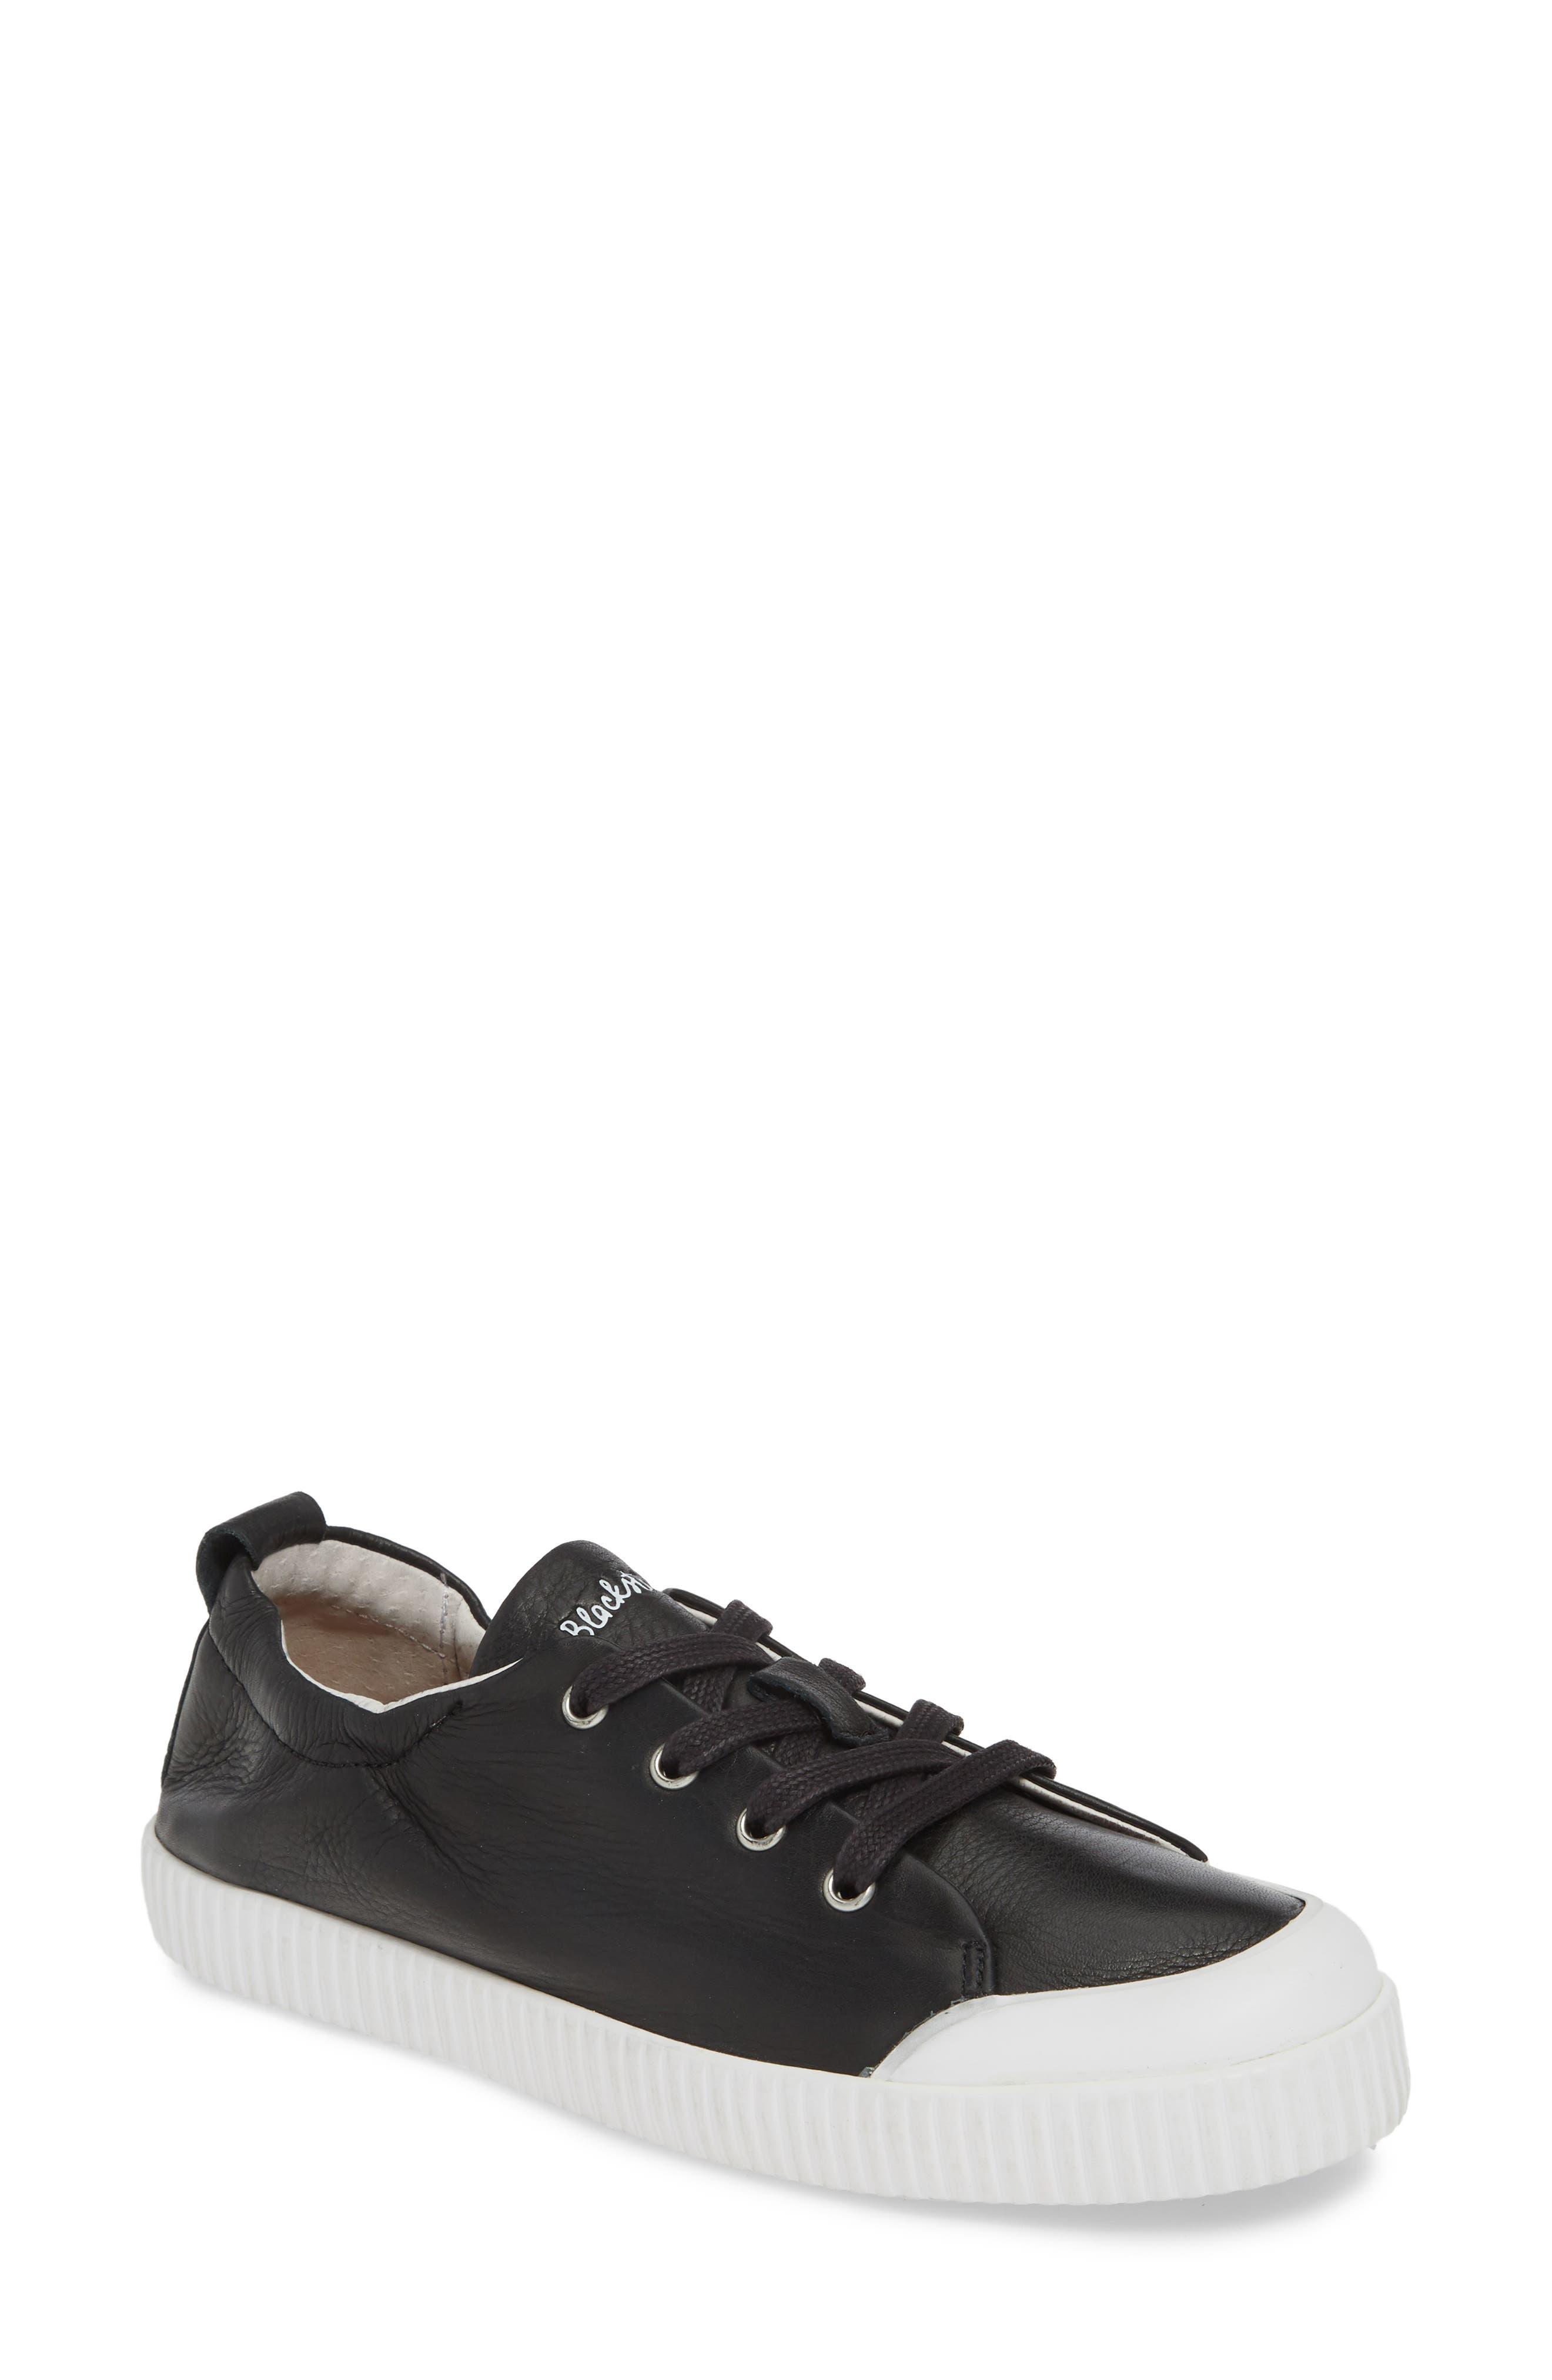 Blackstone Rl78 Low Top Sneaker